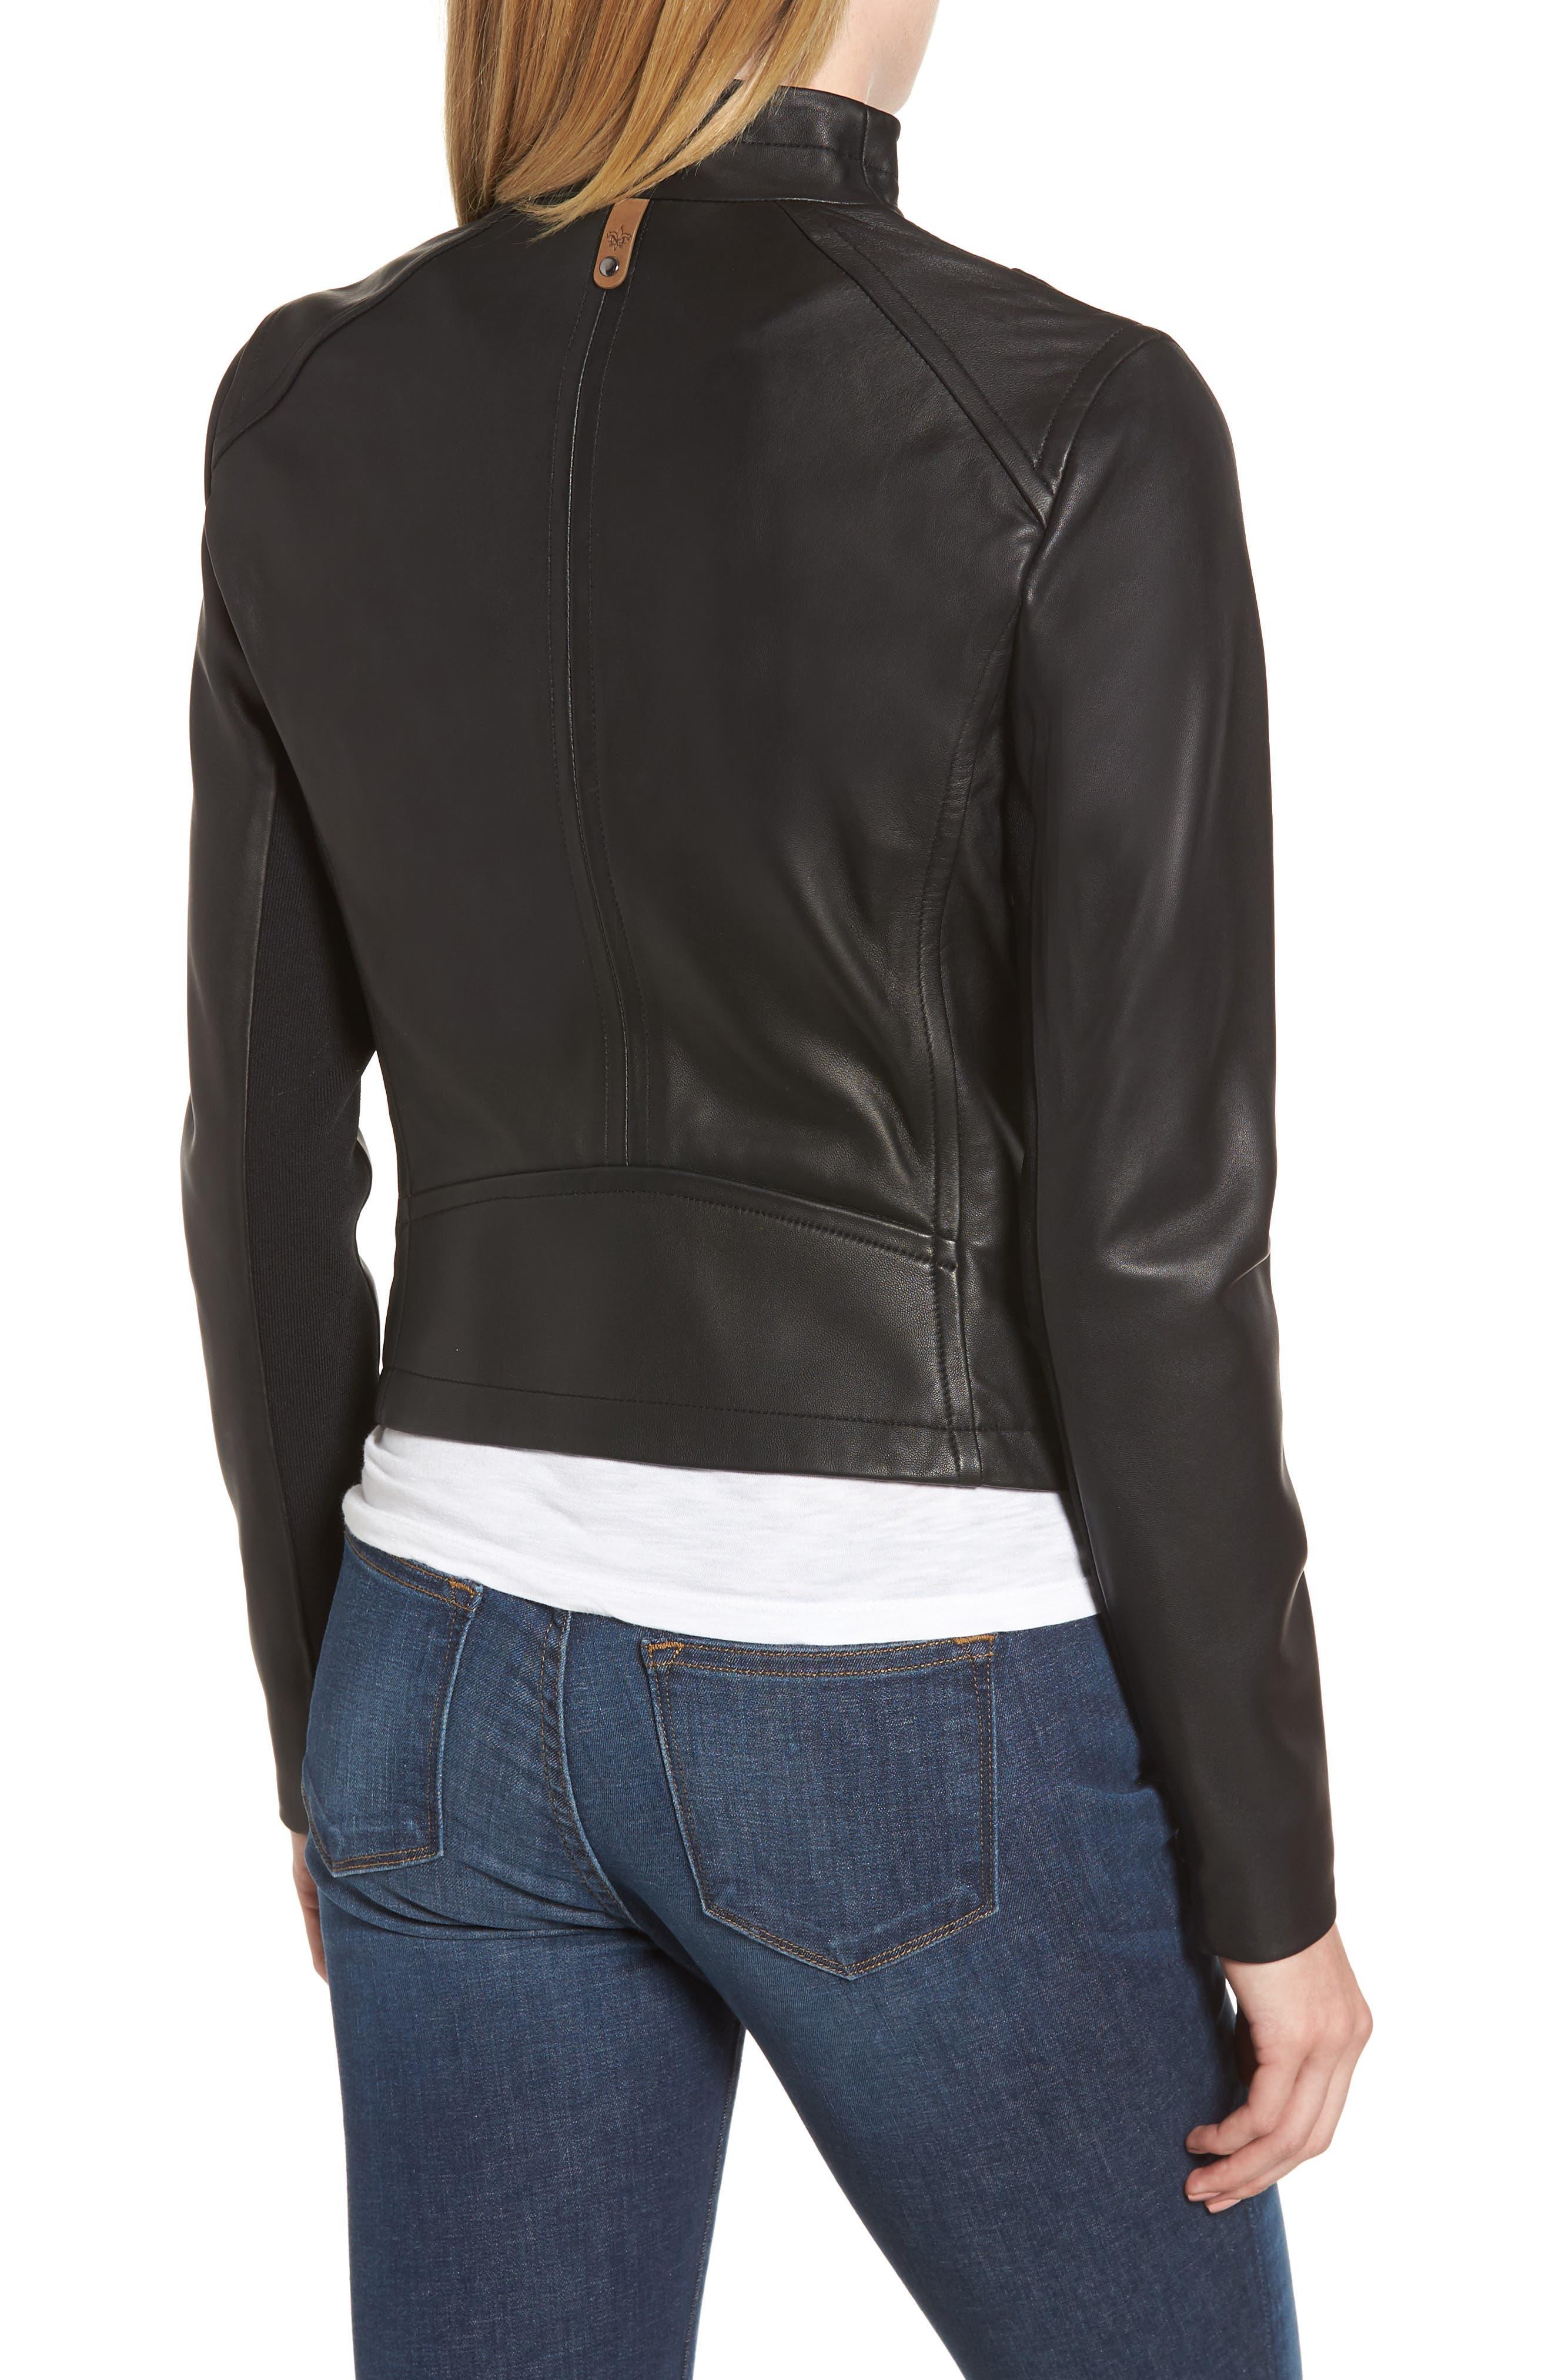 MACKAGE,                             Pina-L Leather Moto Jacket,                             Alternate thumbnail 2, color,                             001